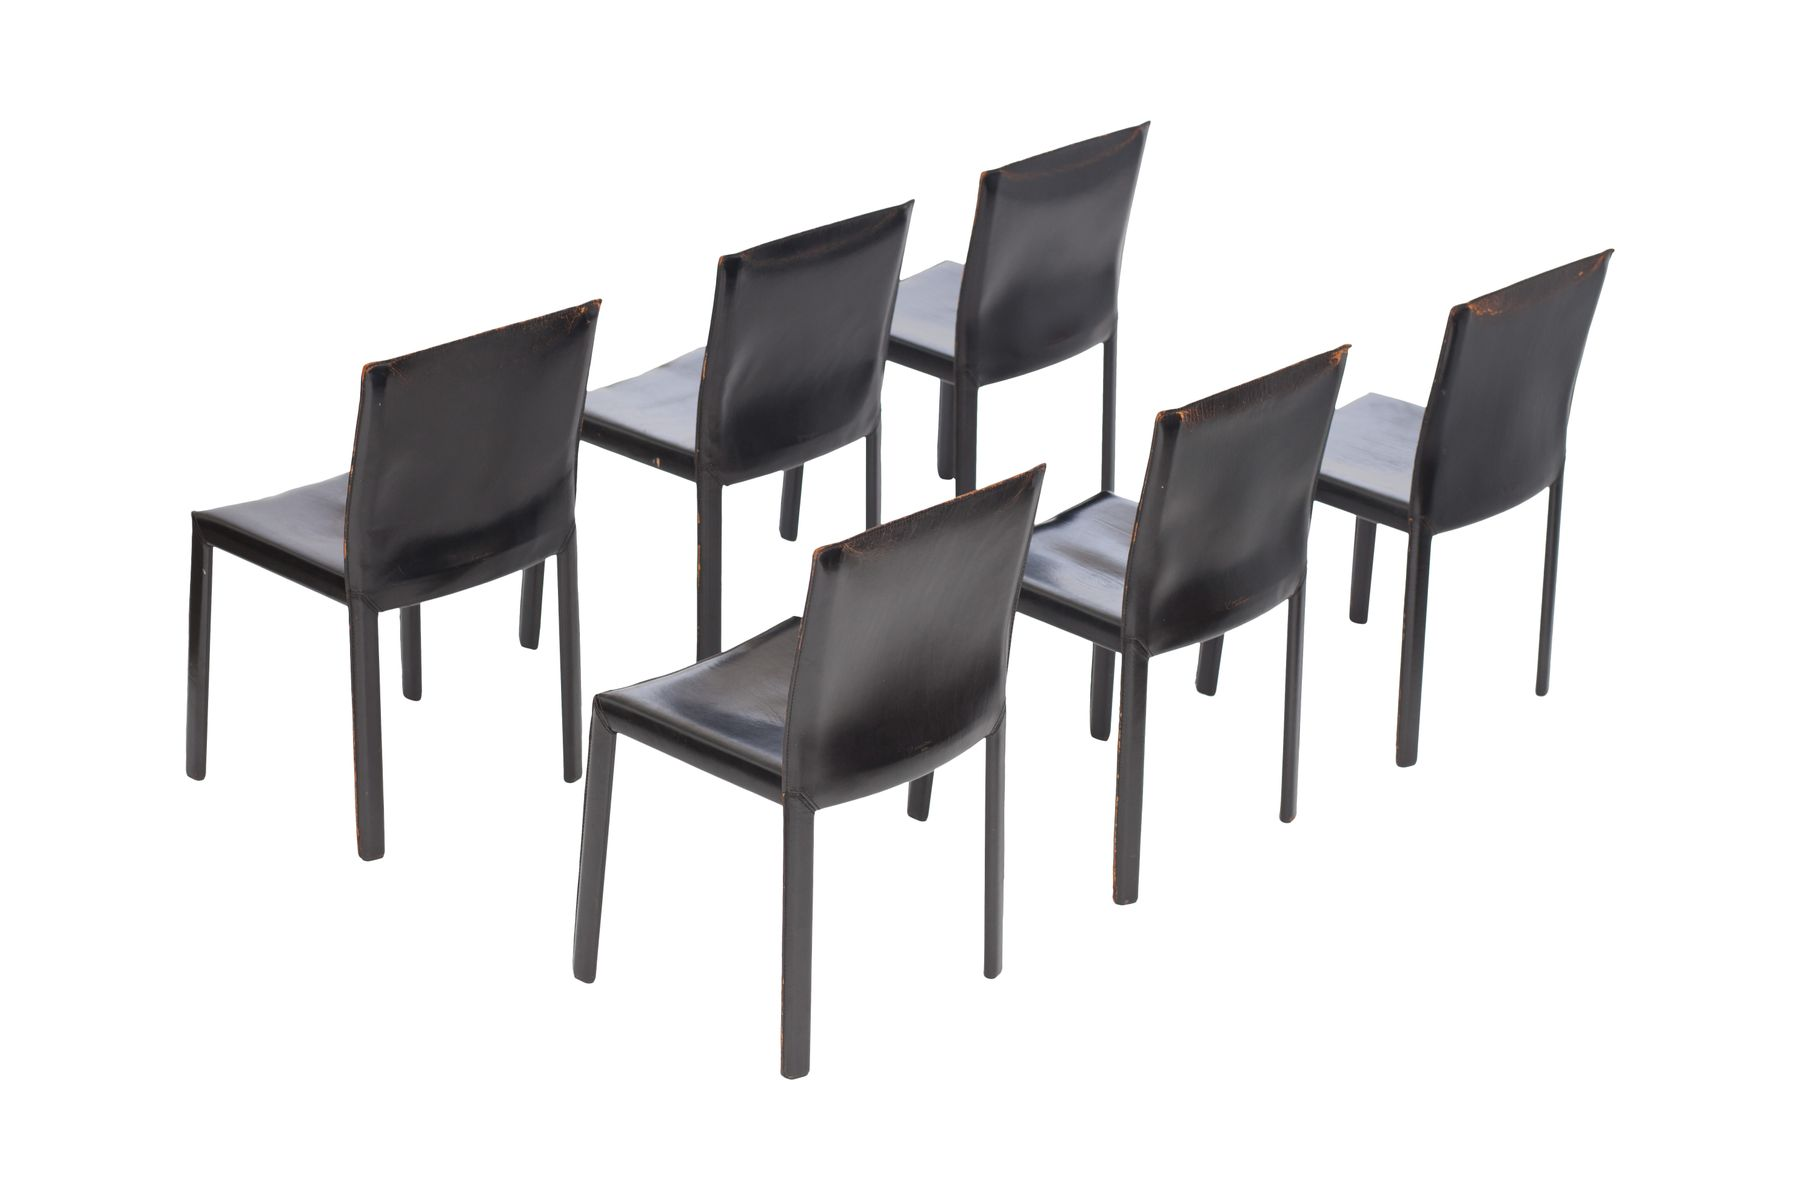 Schwarze Lederstühle schwarze lederstühle studio grassi bianchi für pellizoni